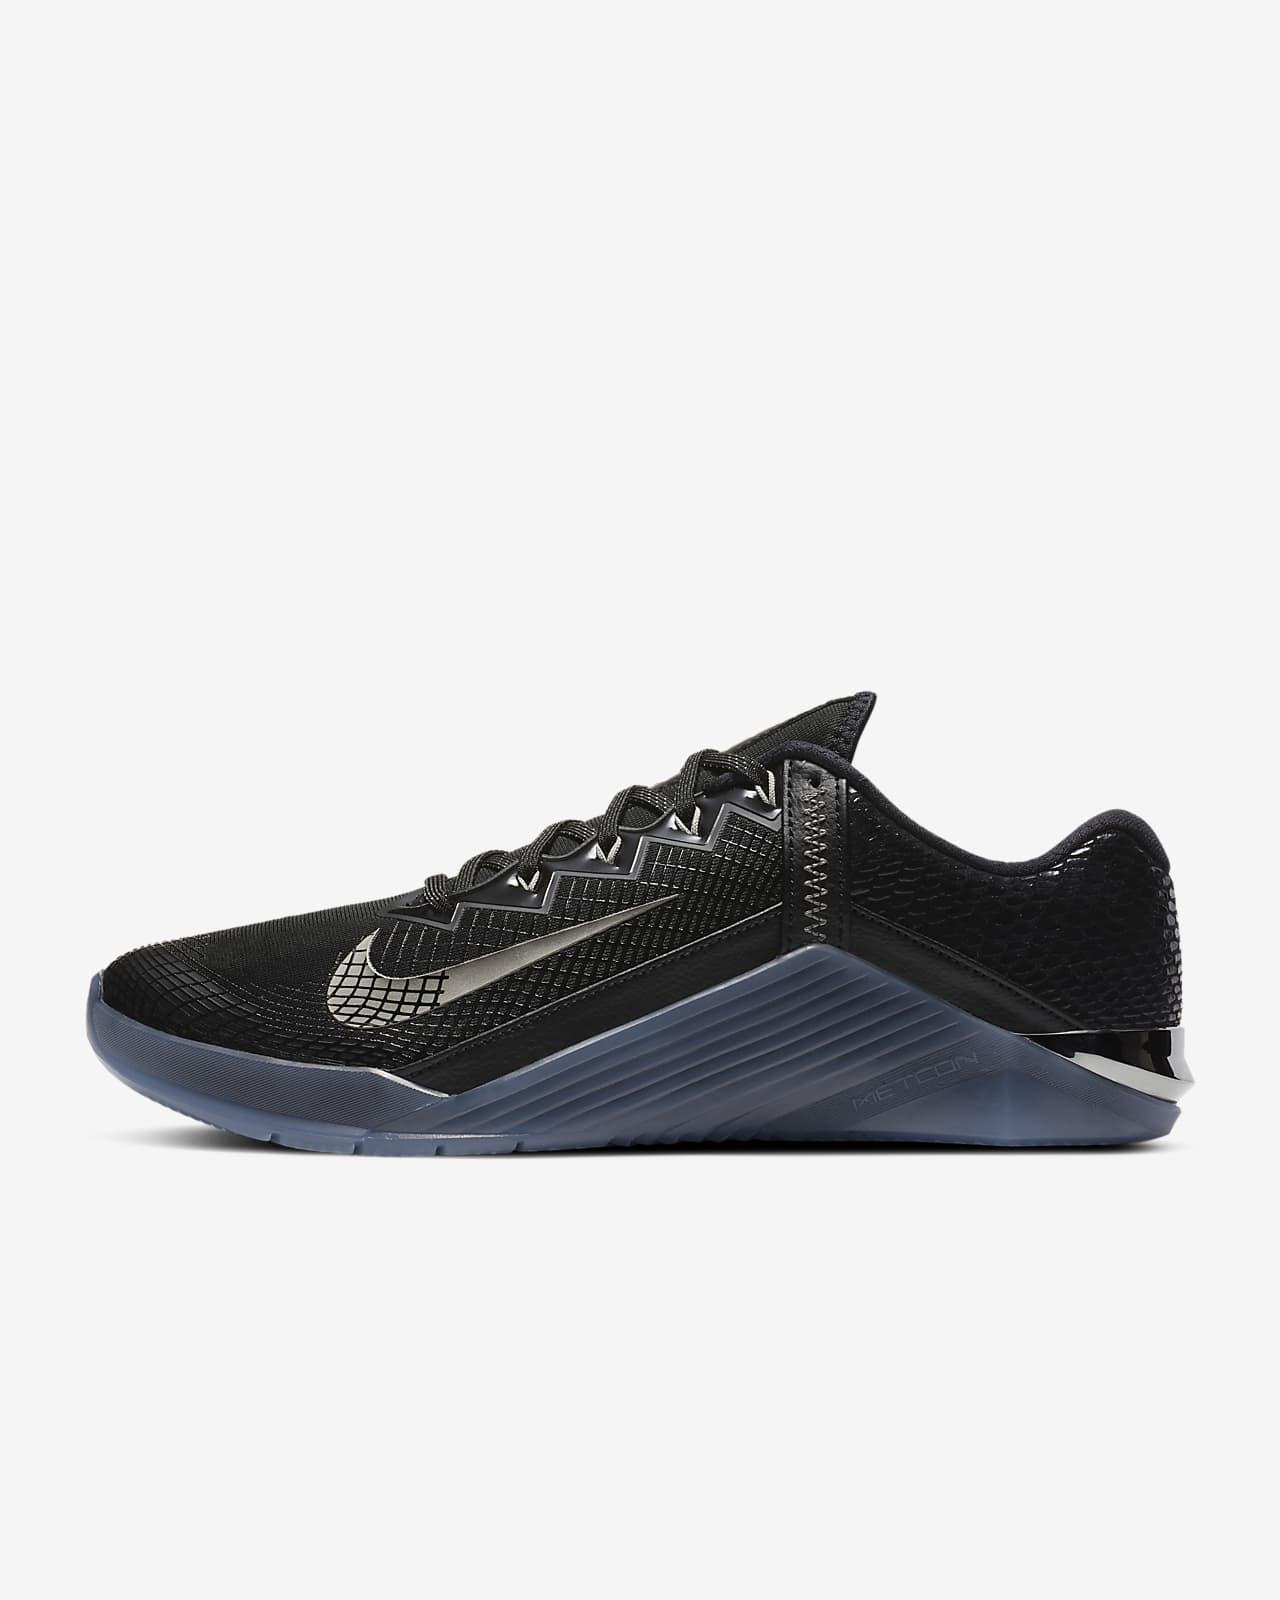 Nike Metcon 6 AMP Training Shoe